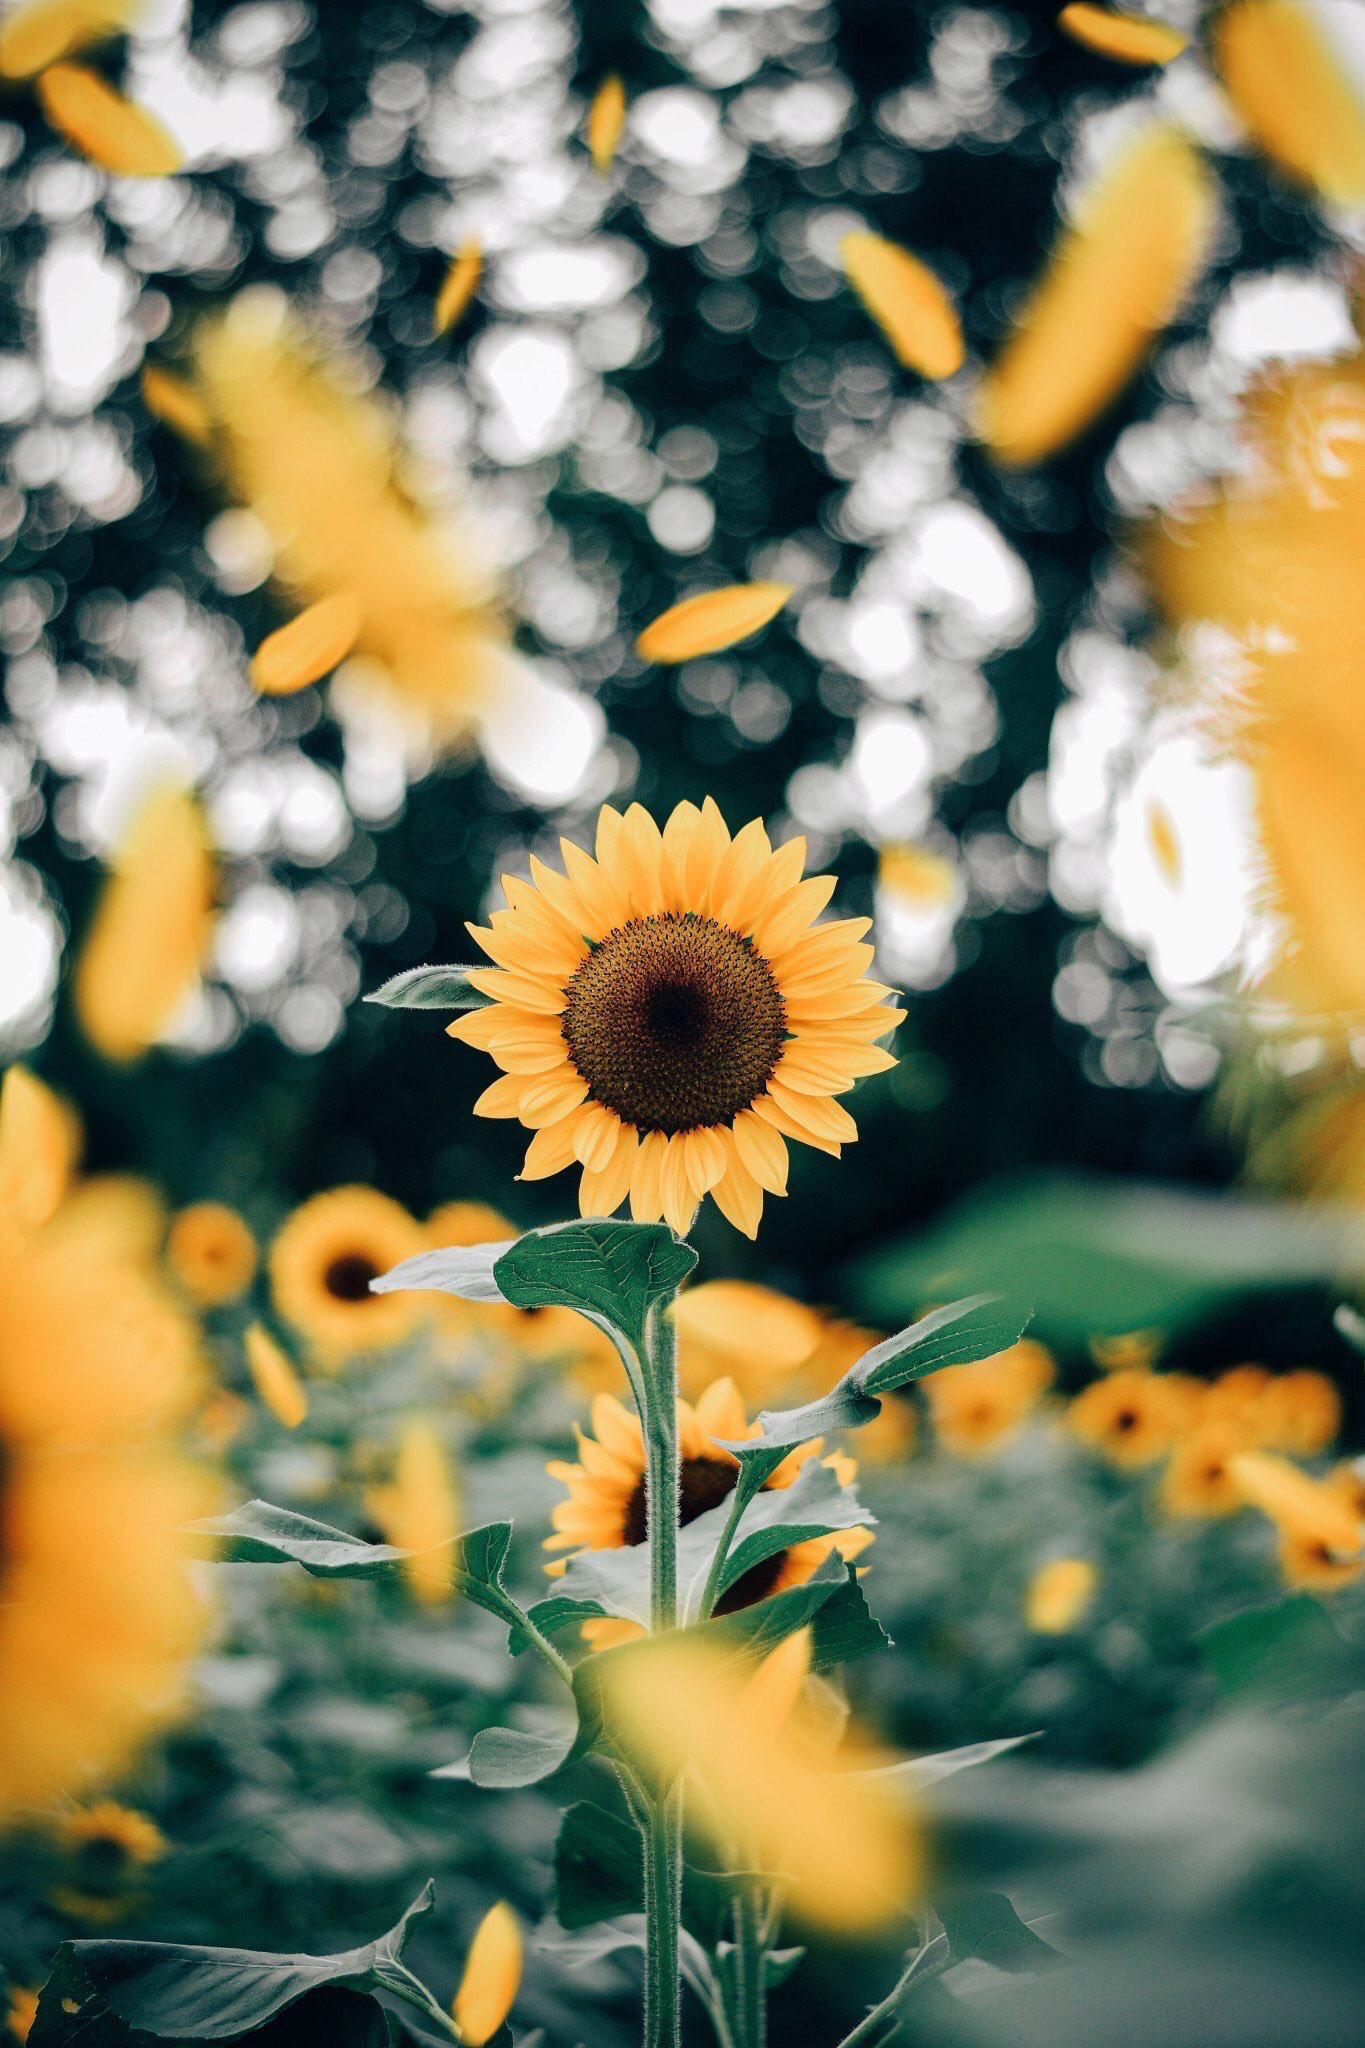 Nature Sunflower wallpaper, Flowers photography, Flower